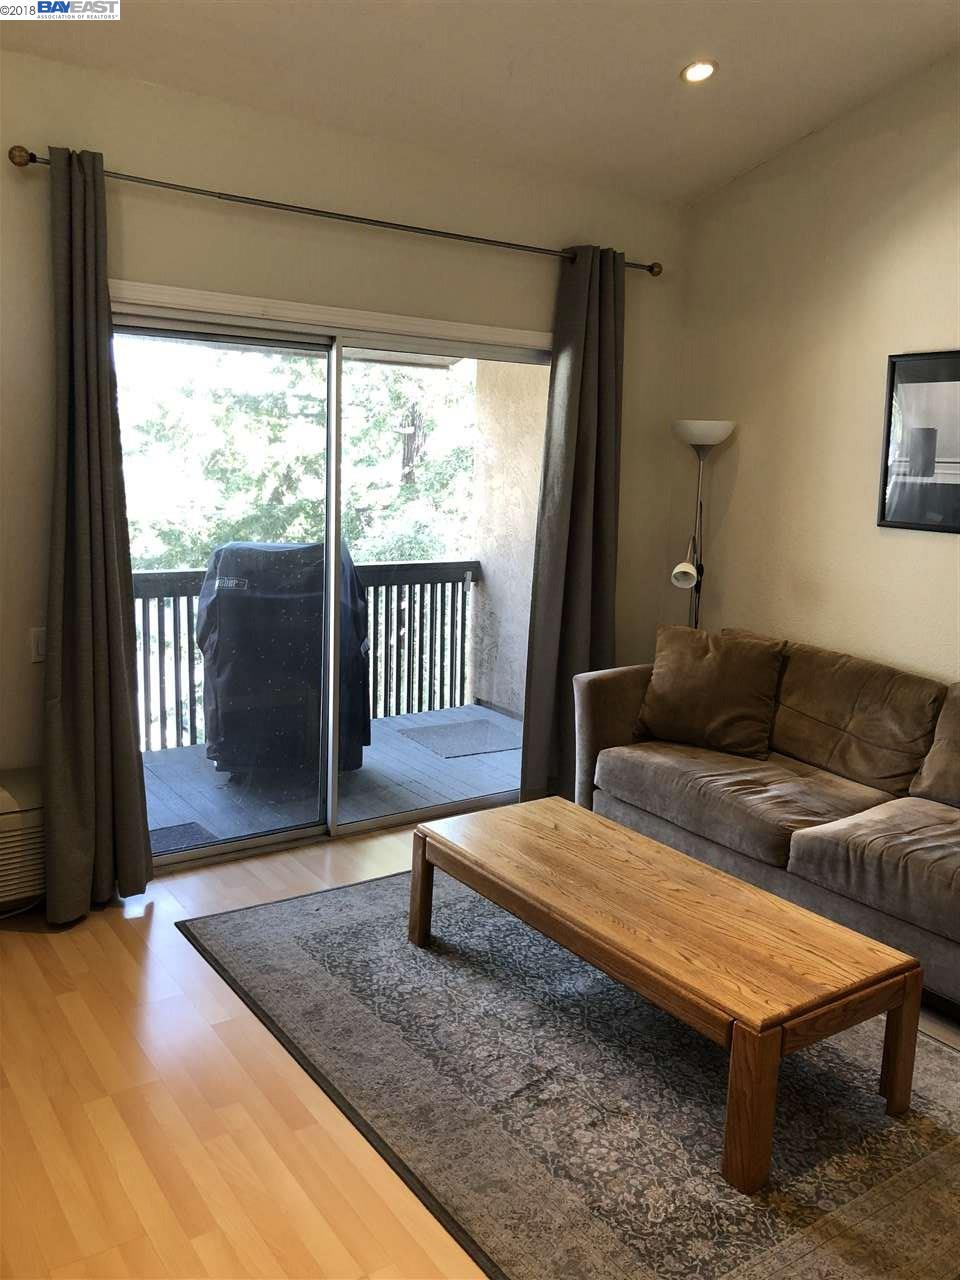 Condominium for Sale at 155 Sharene Lane 155 Sharene Lane Walnut Creek, California 94596 United States